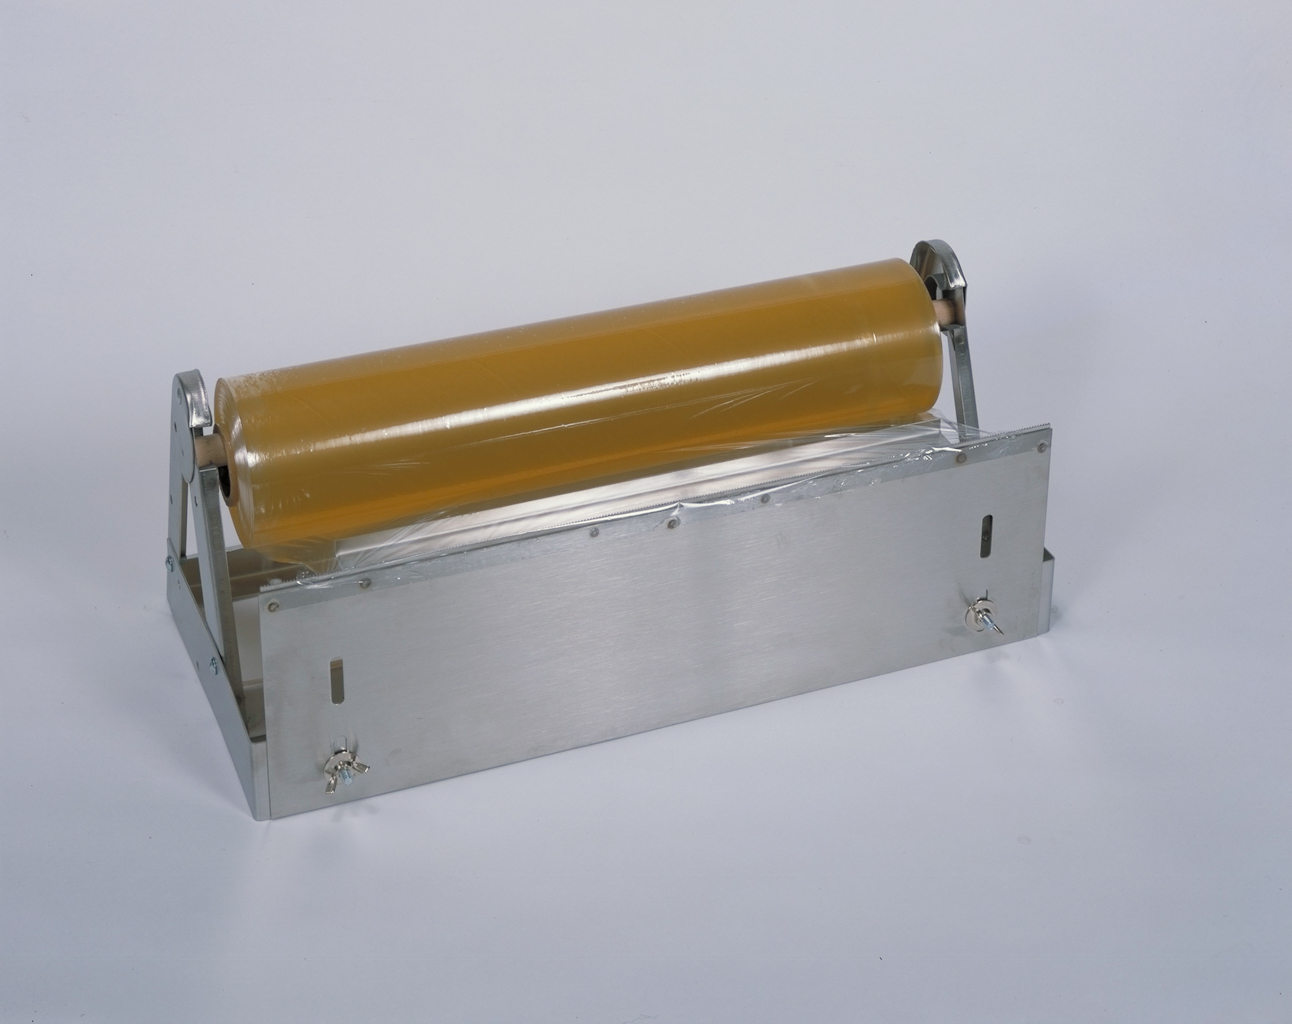 Food Wrap Film Dispenser